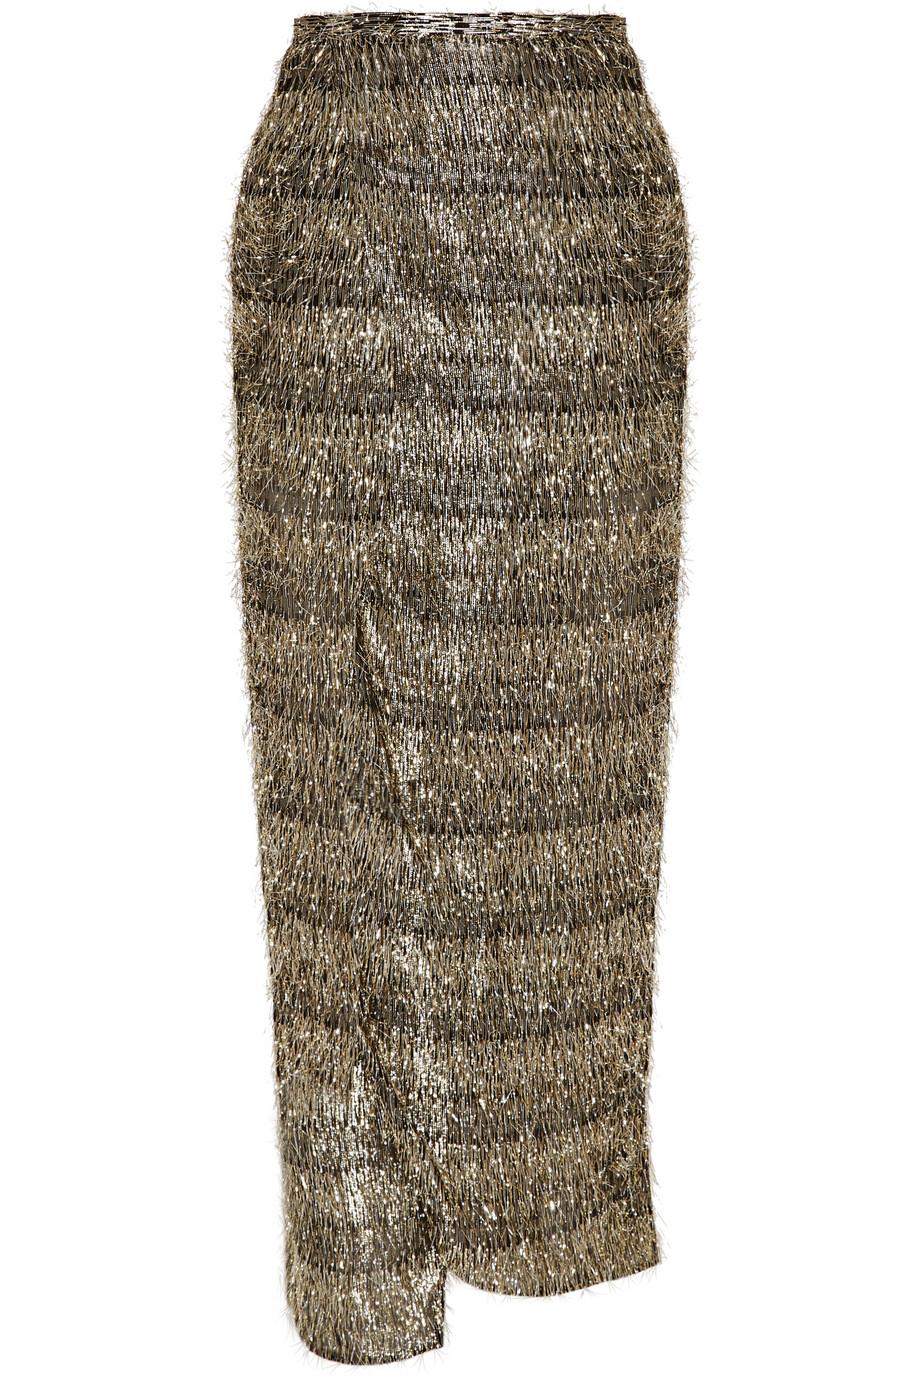 Baja East Lurex-Fringed Chiffon Wrap Skirt, Gold, Women's, Size: 1